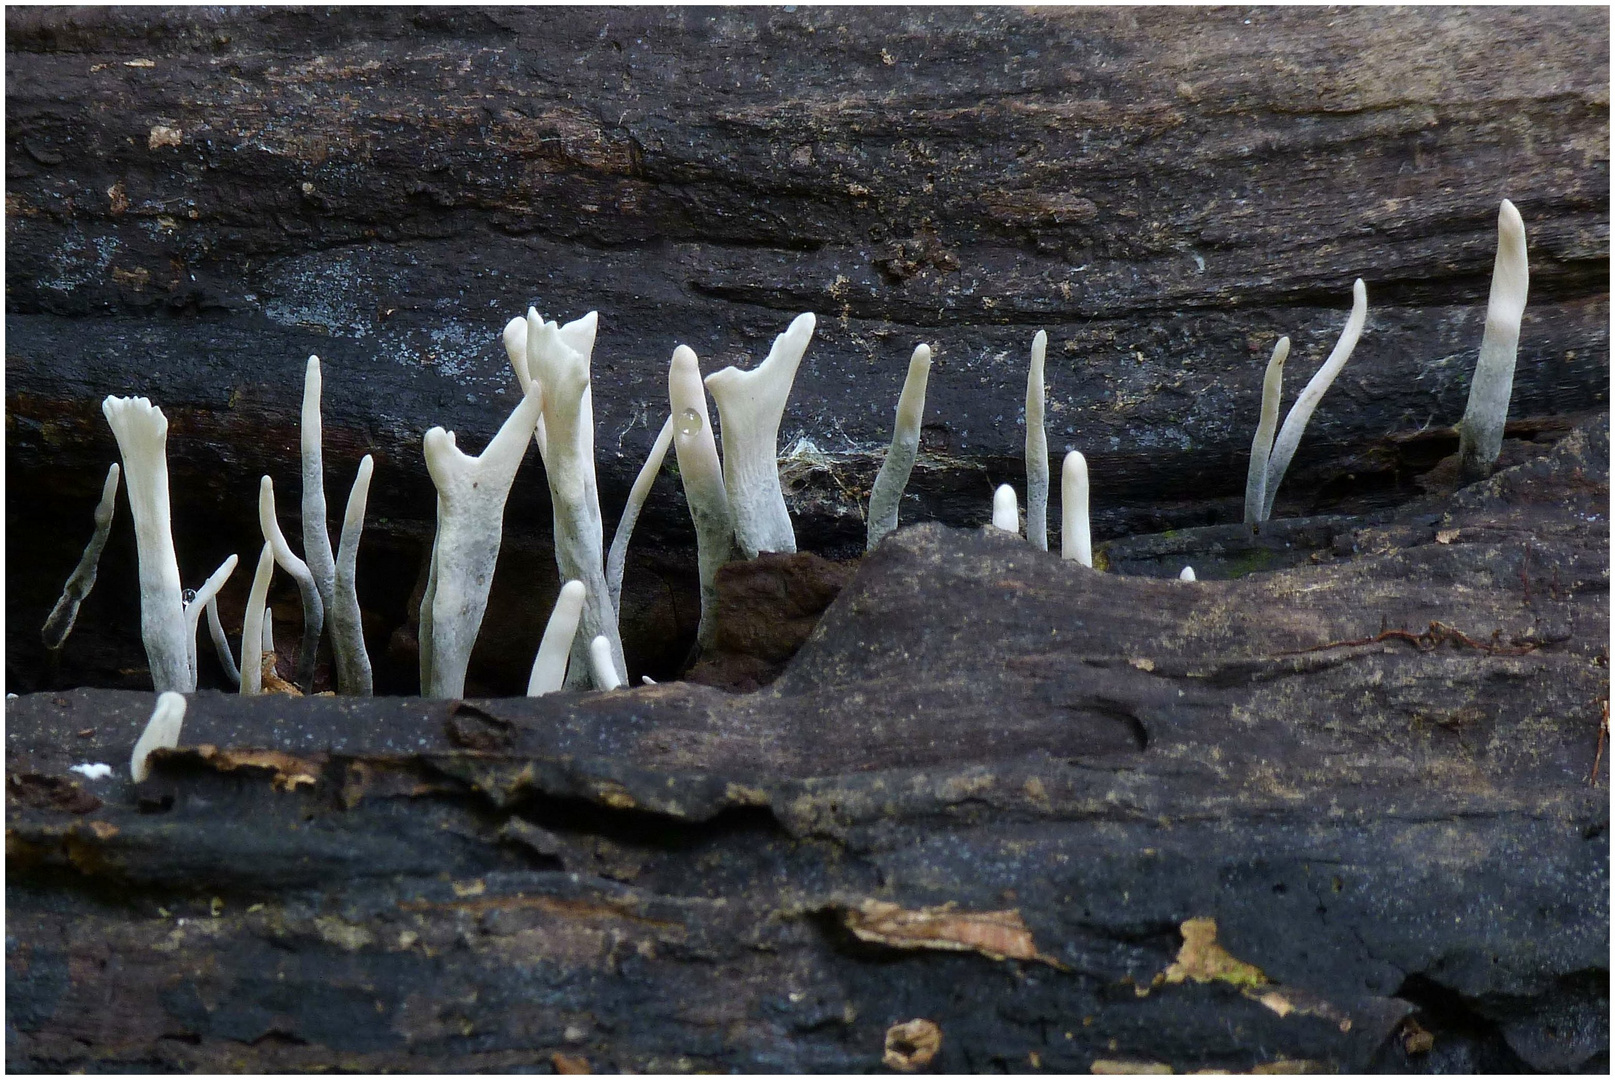 Gewihförmige Holzkeule